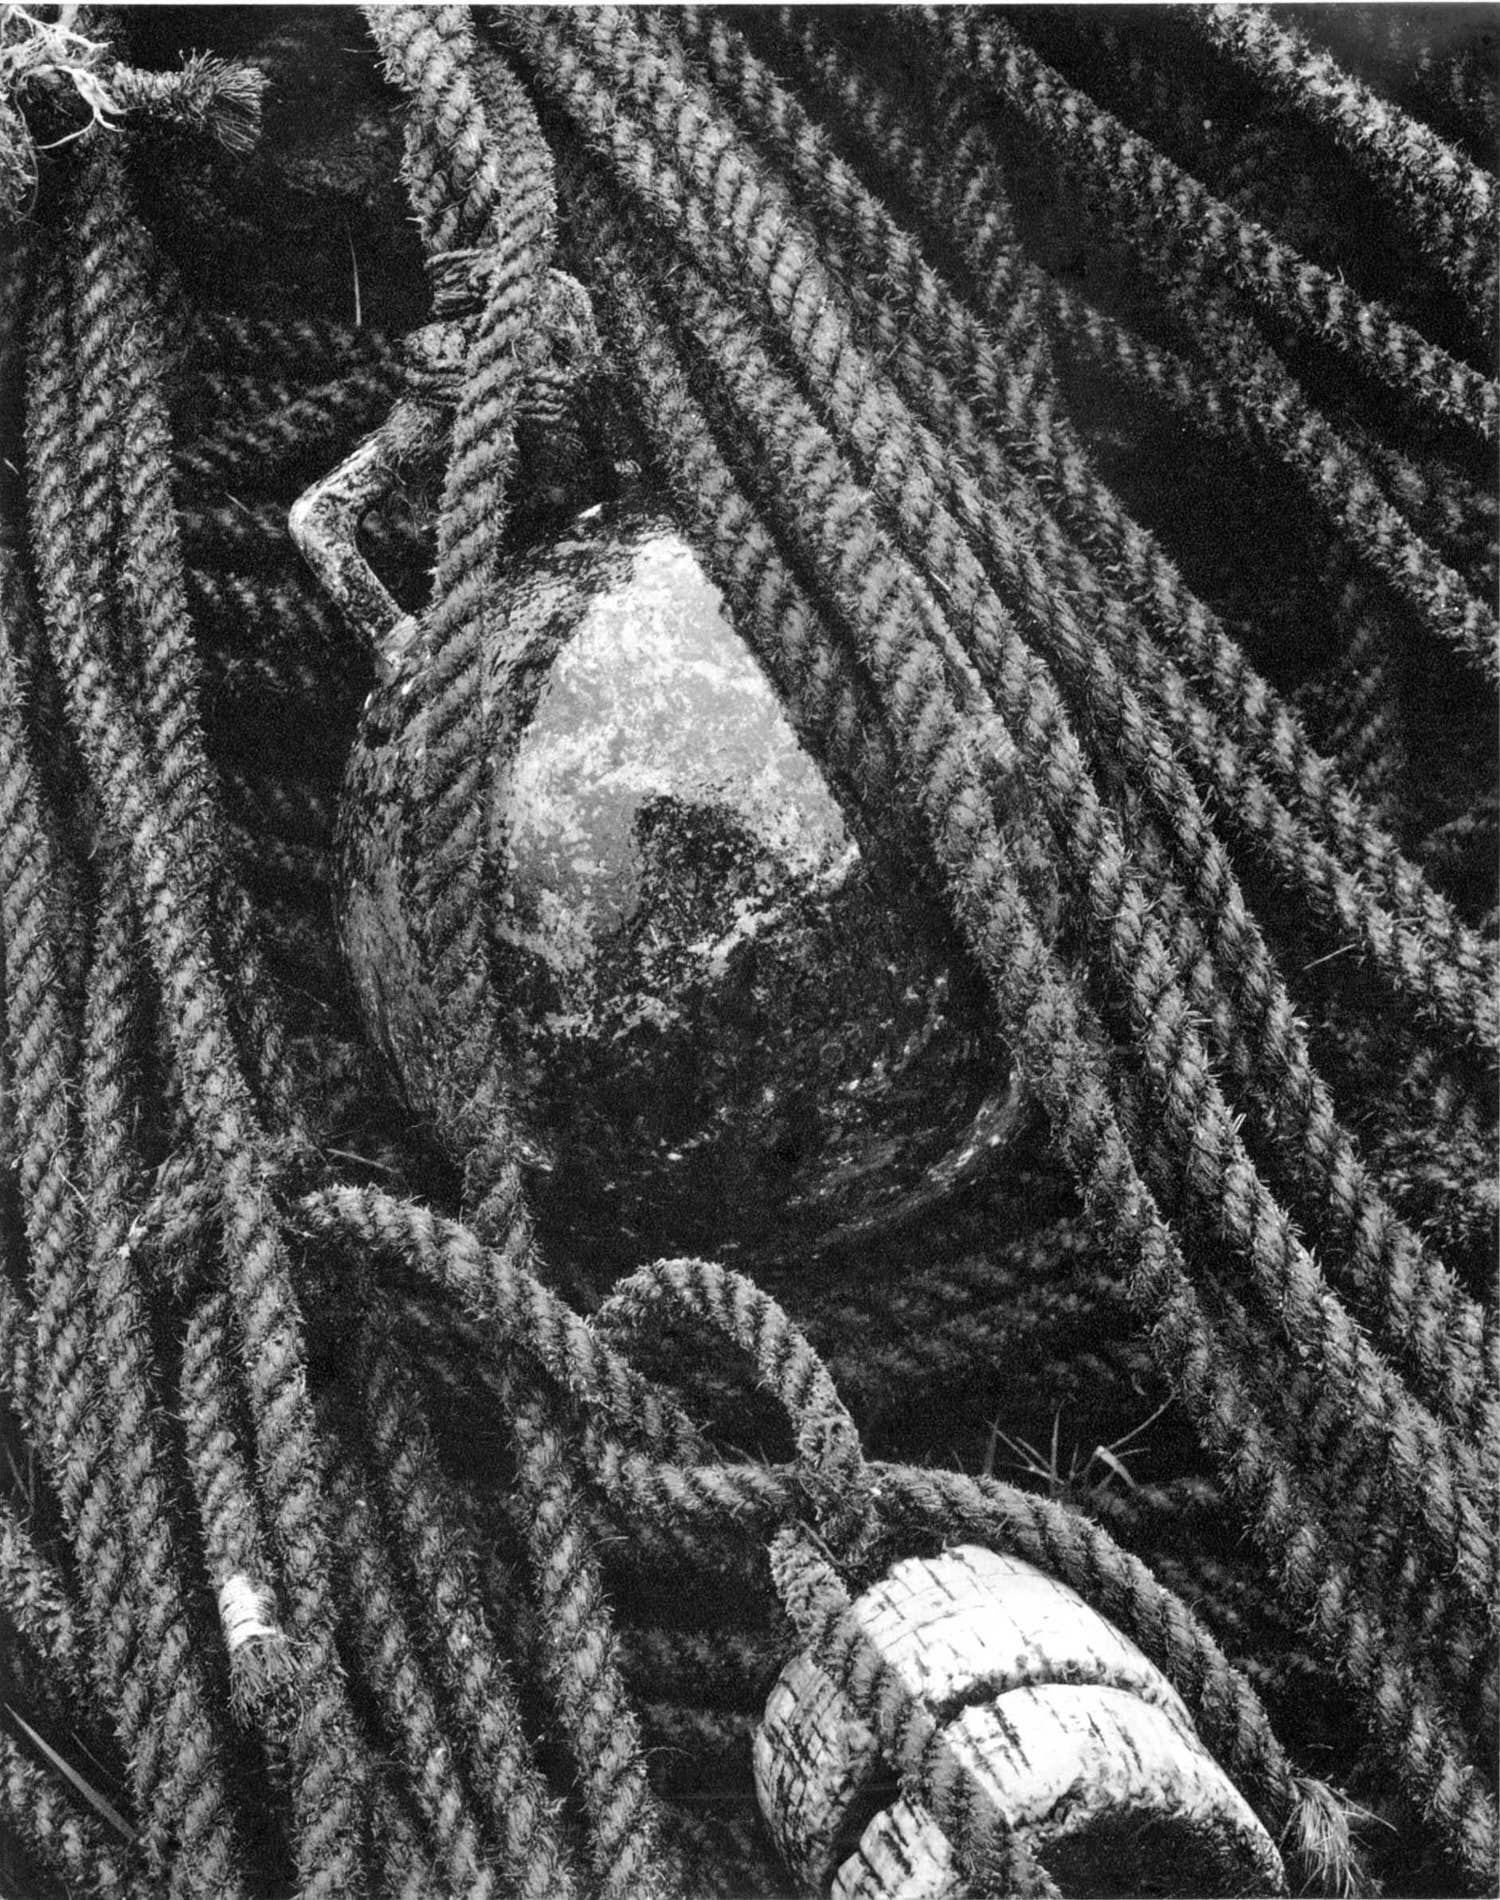 ropes_and_buoy_ps.jpg